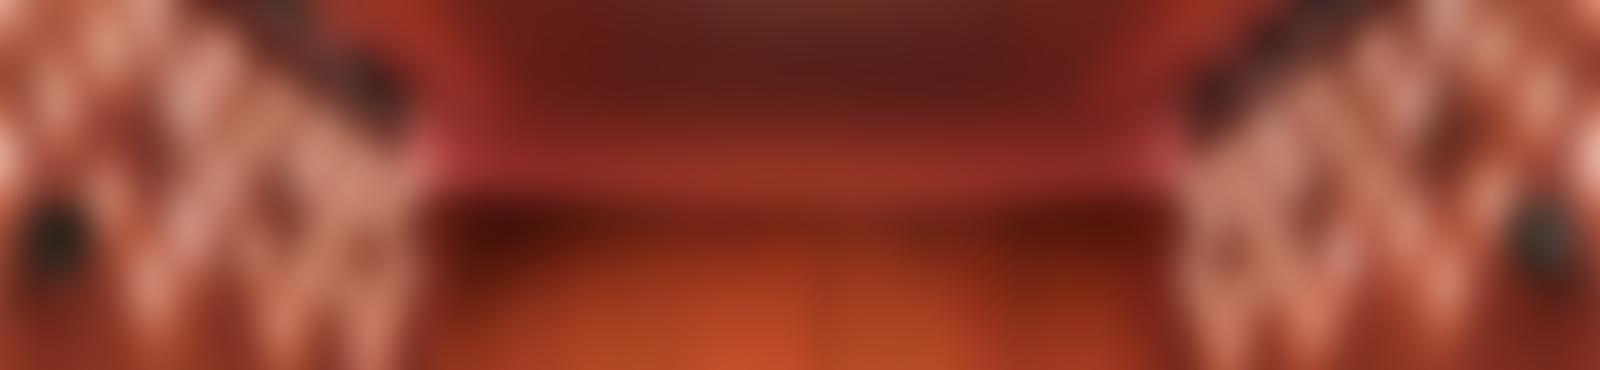 Blurred dh d 000074473 94 v2 send